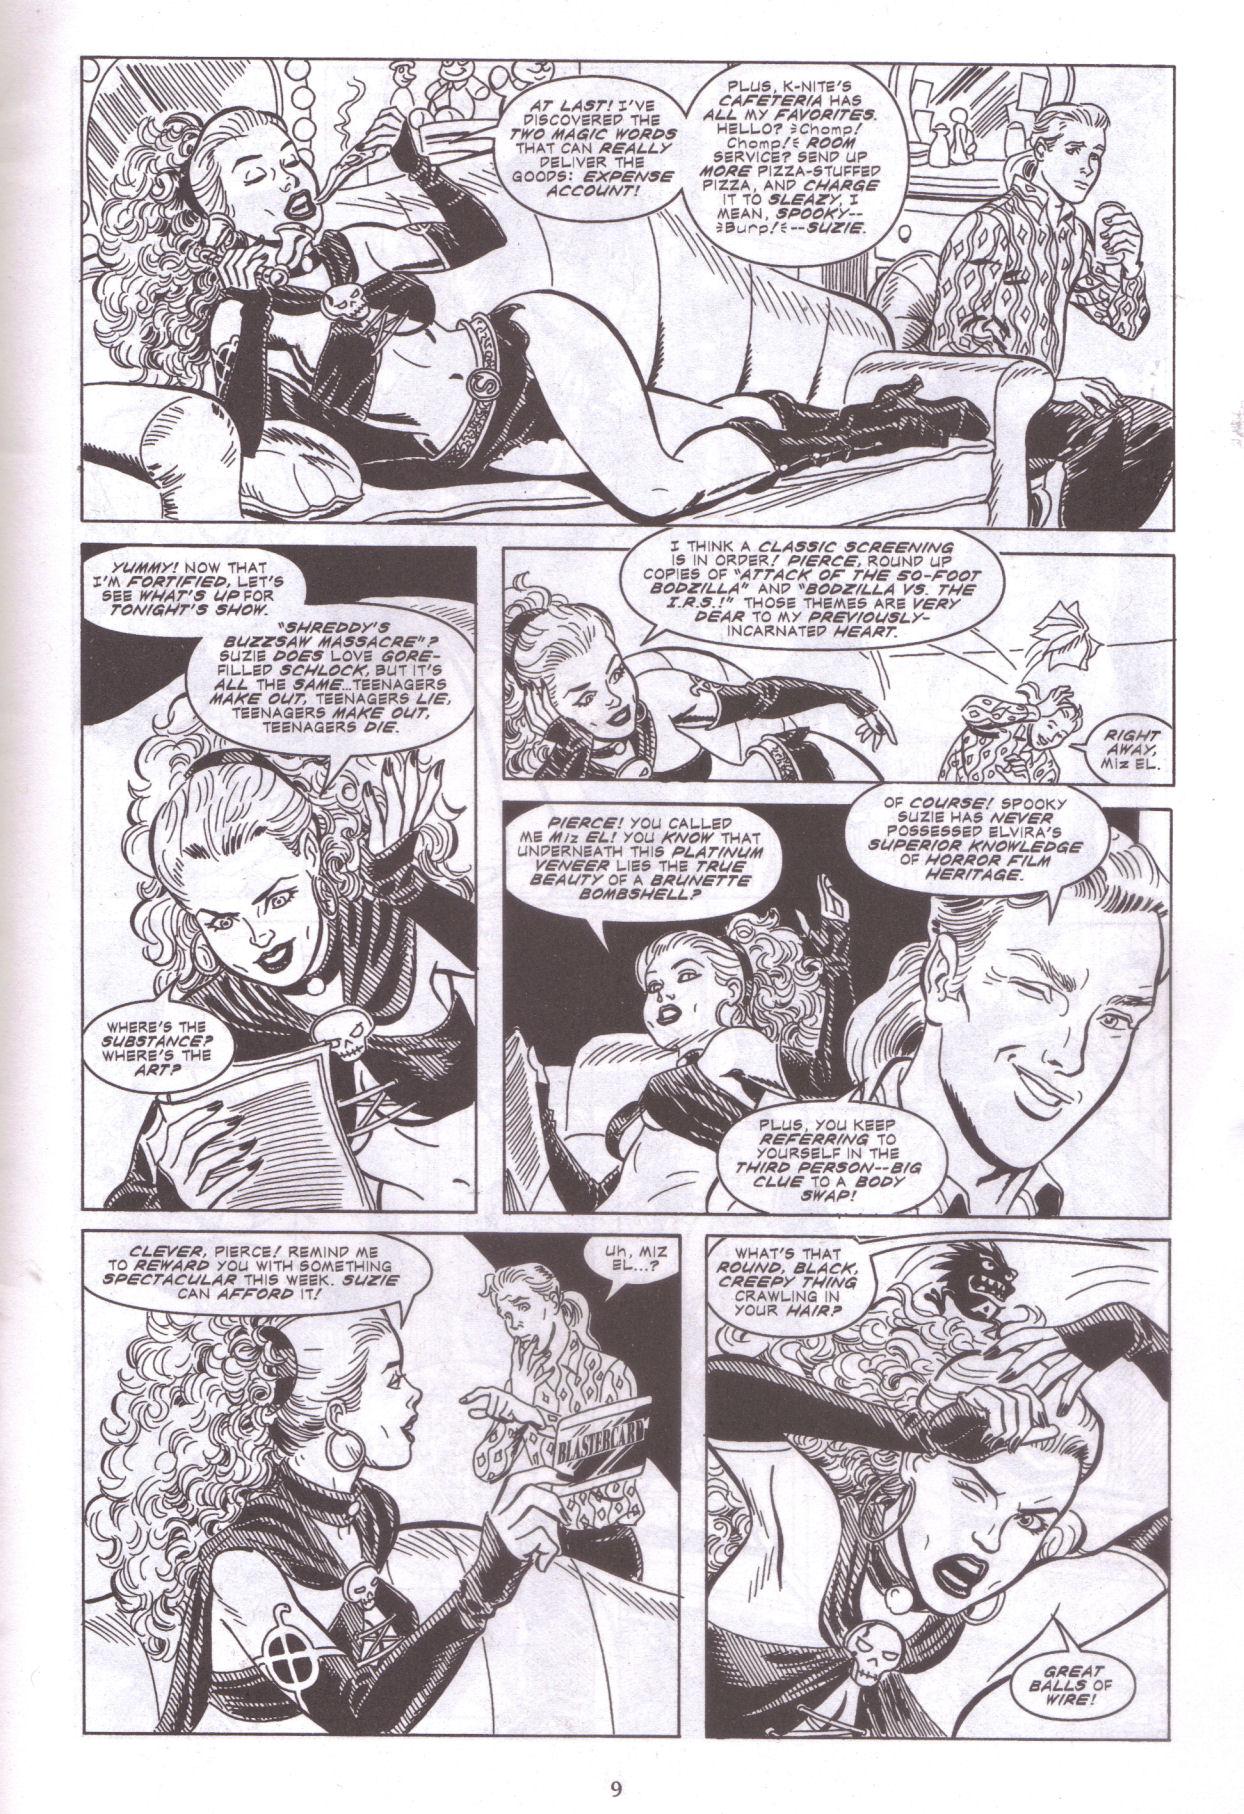 Read online Elvira, Mistress of the Dark comic -  Issue #159 - 11